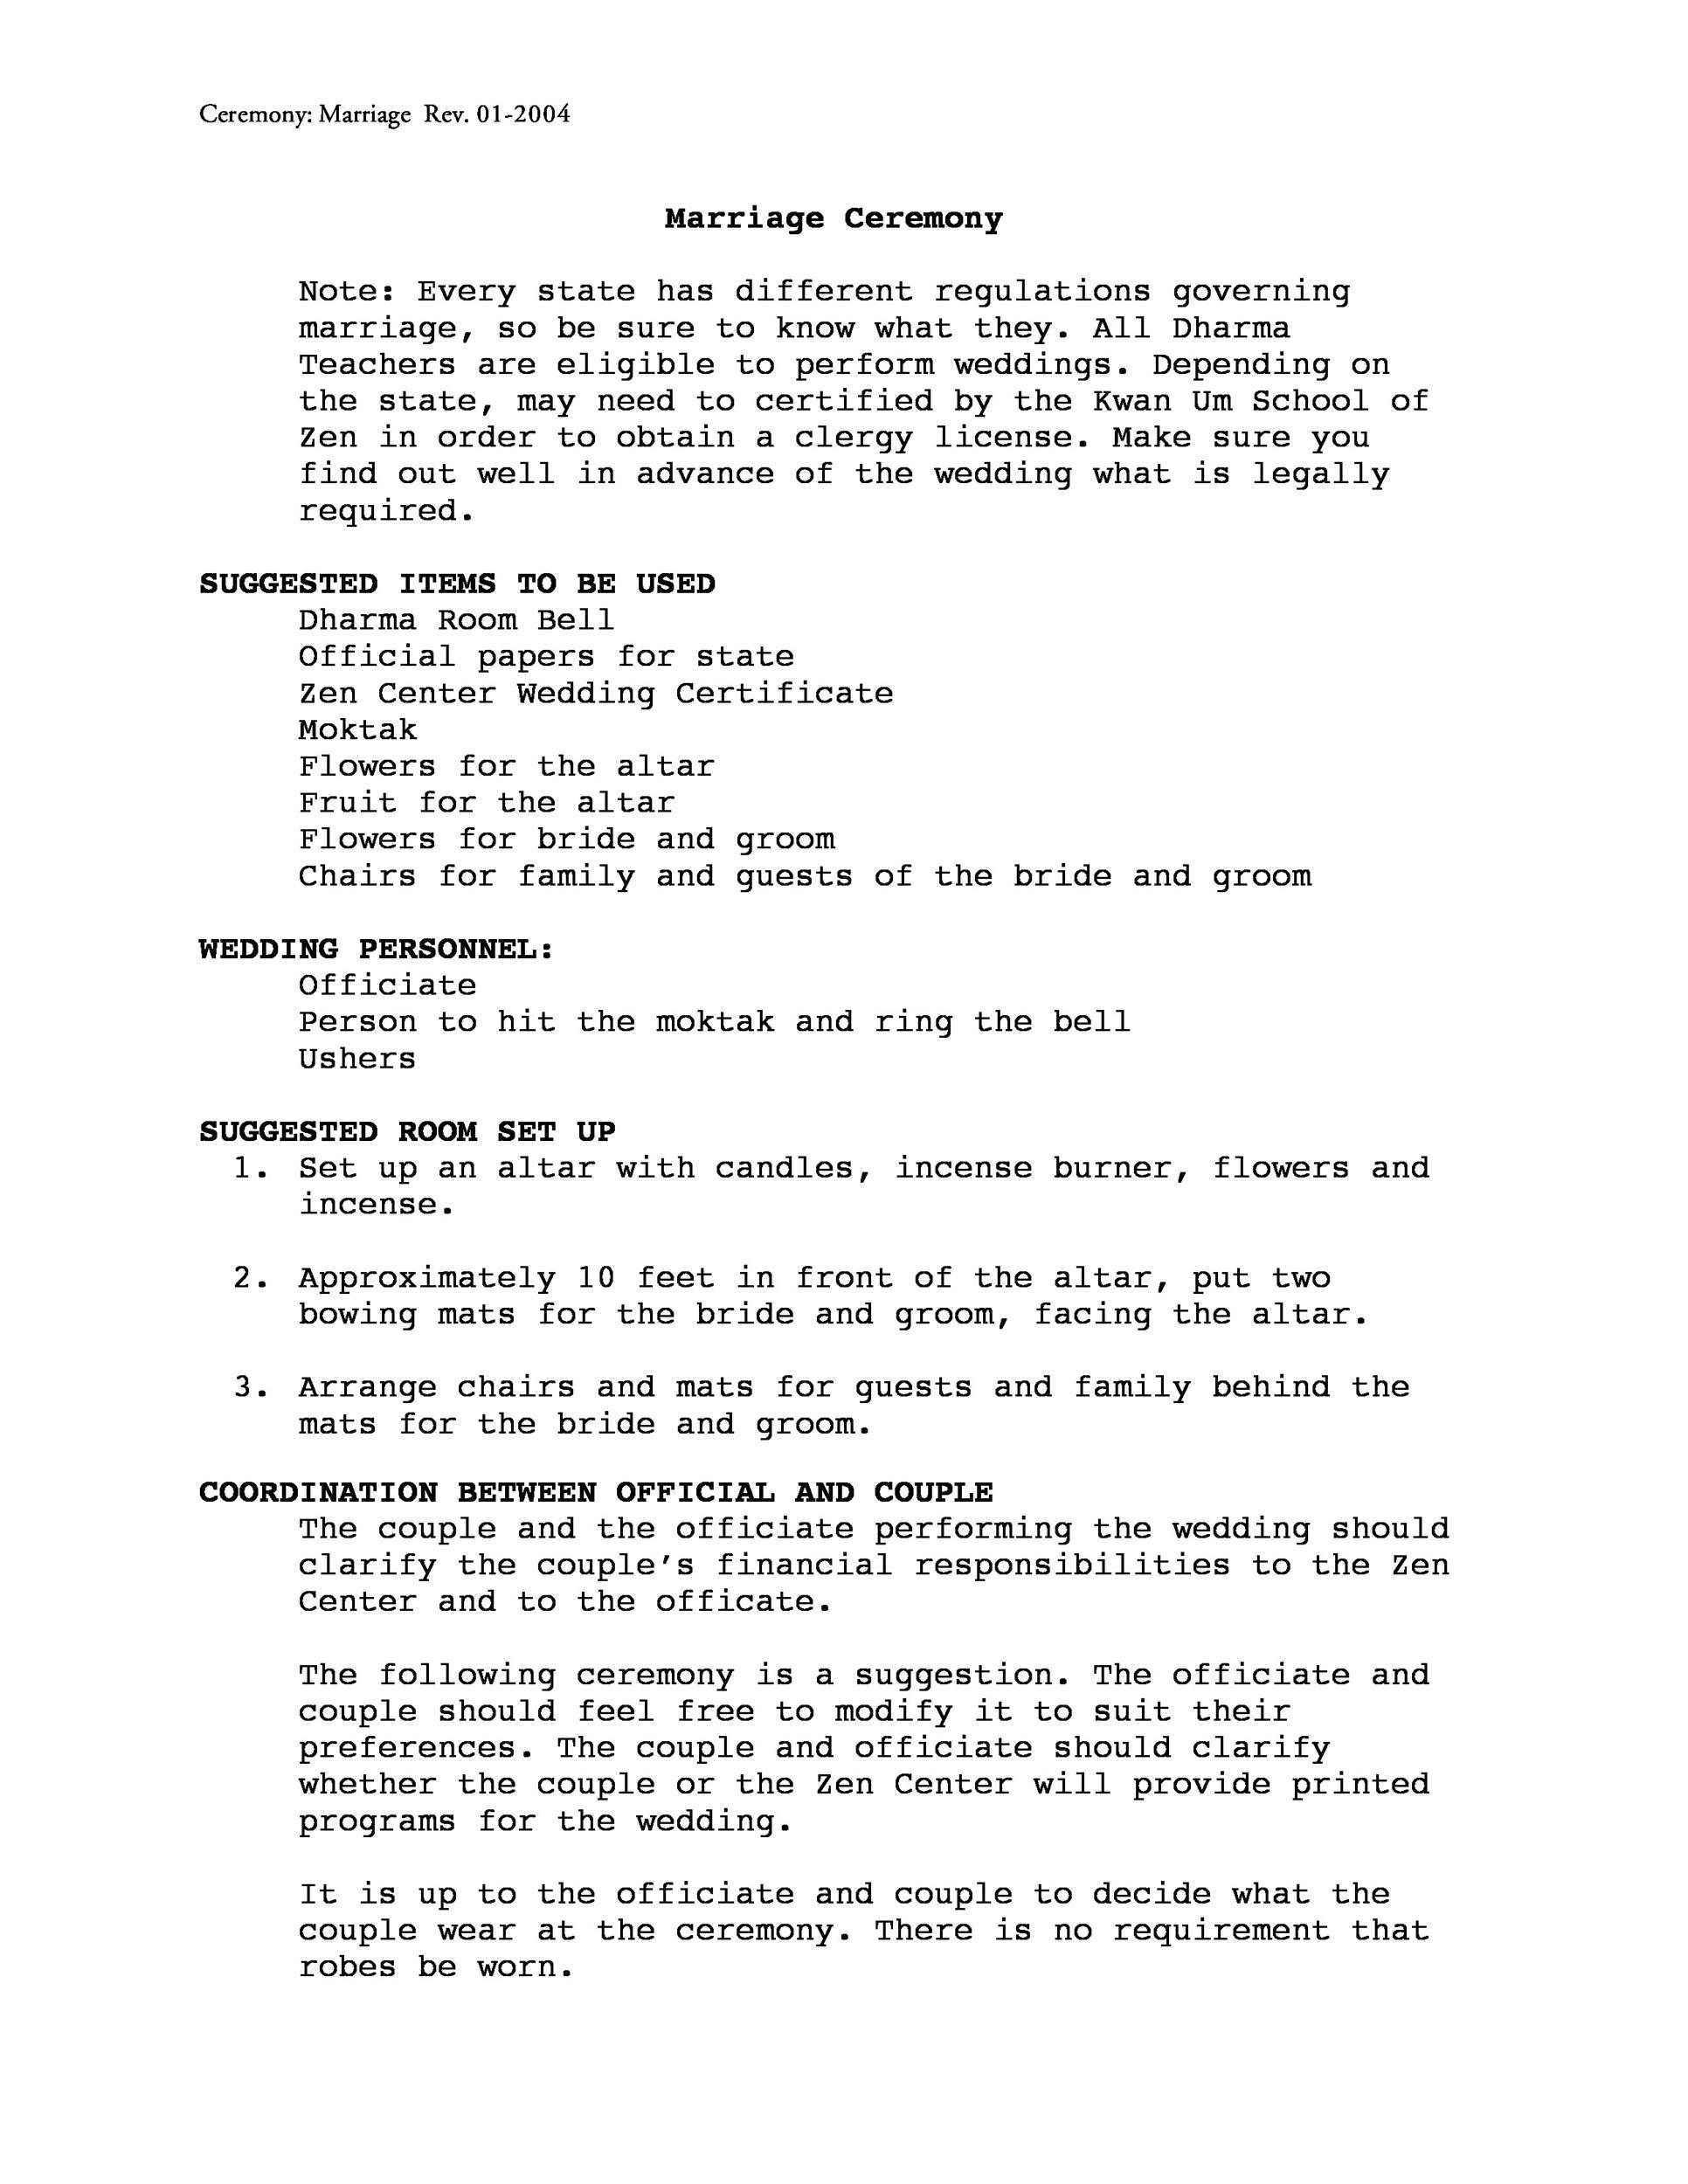 37 Printable Wedding Program Examples Templates ᐅ Templatelab